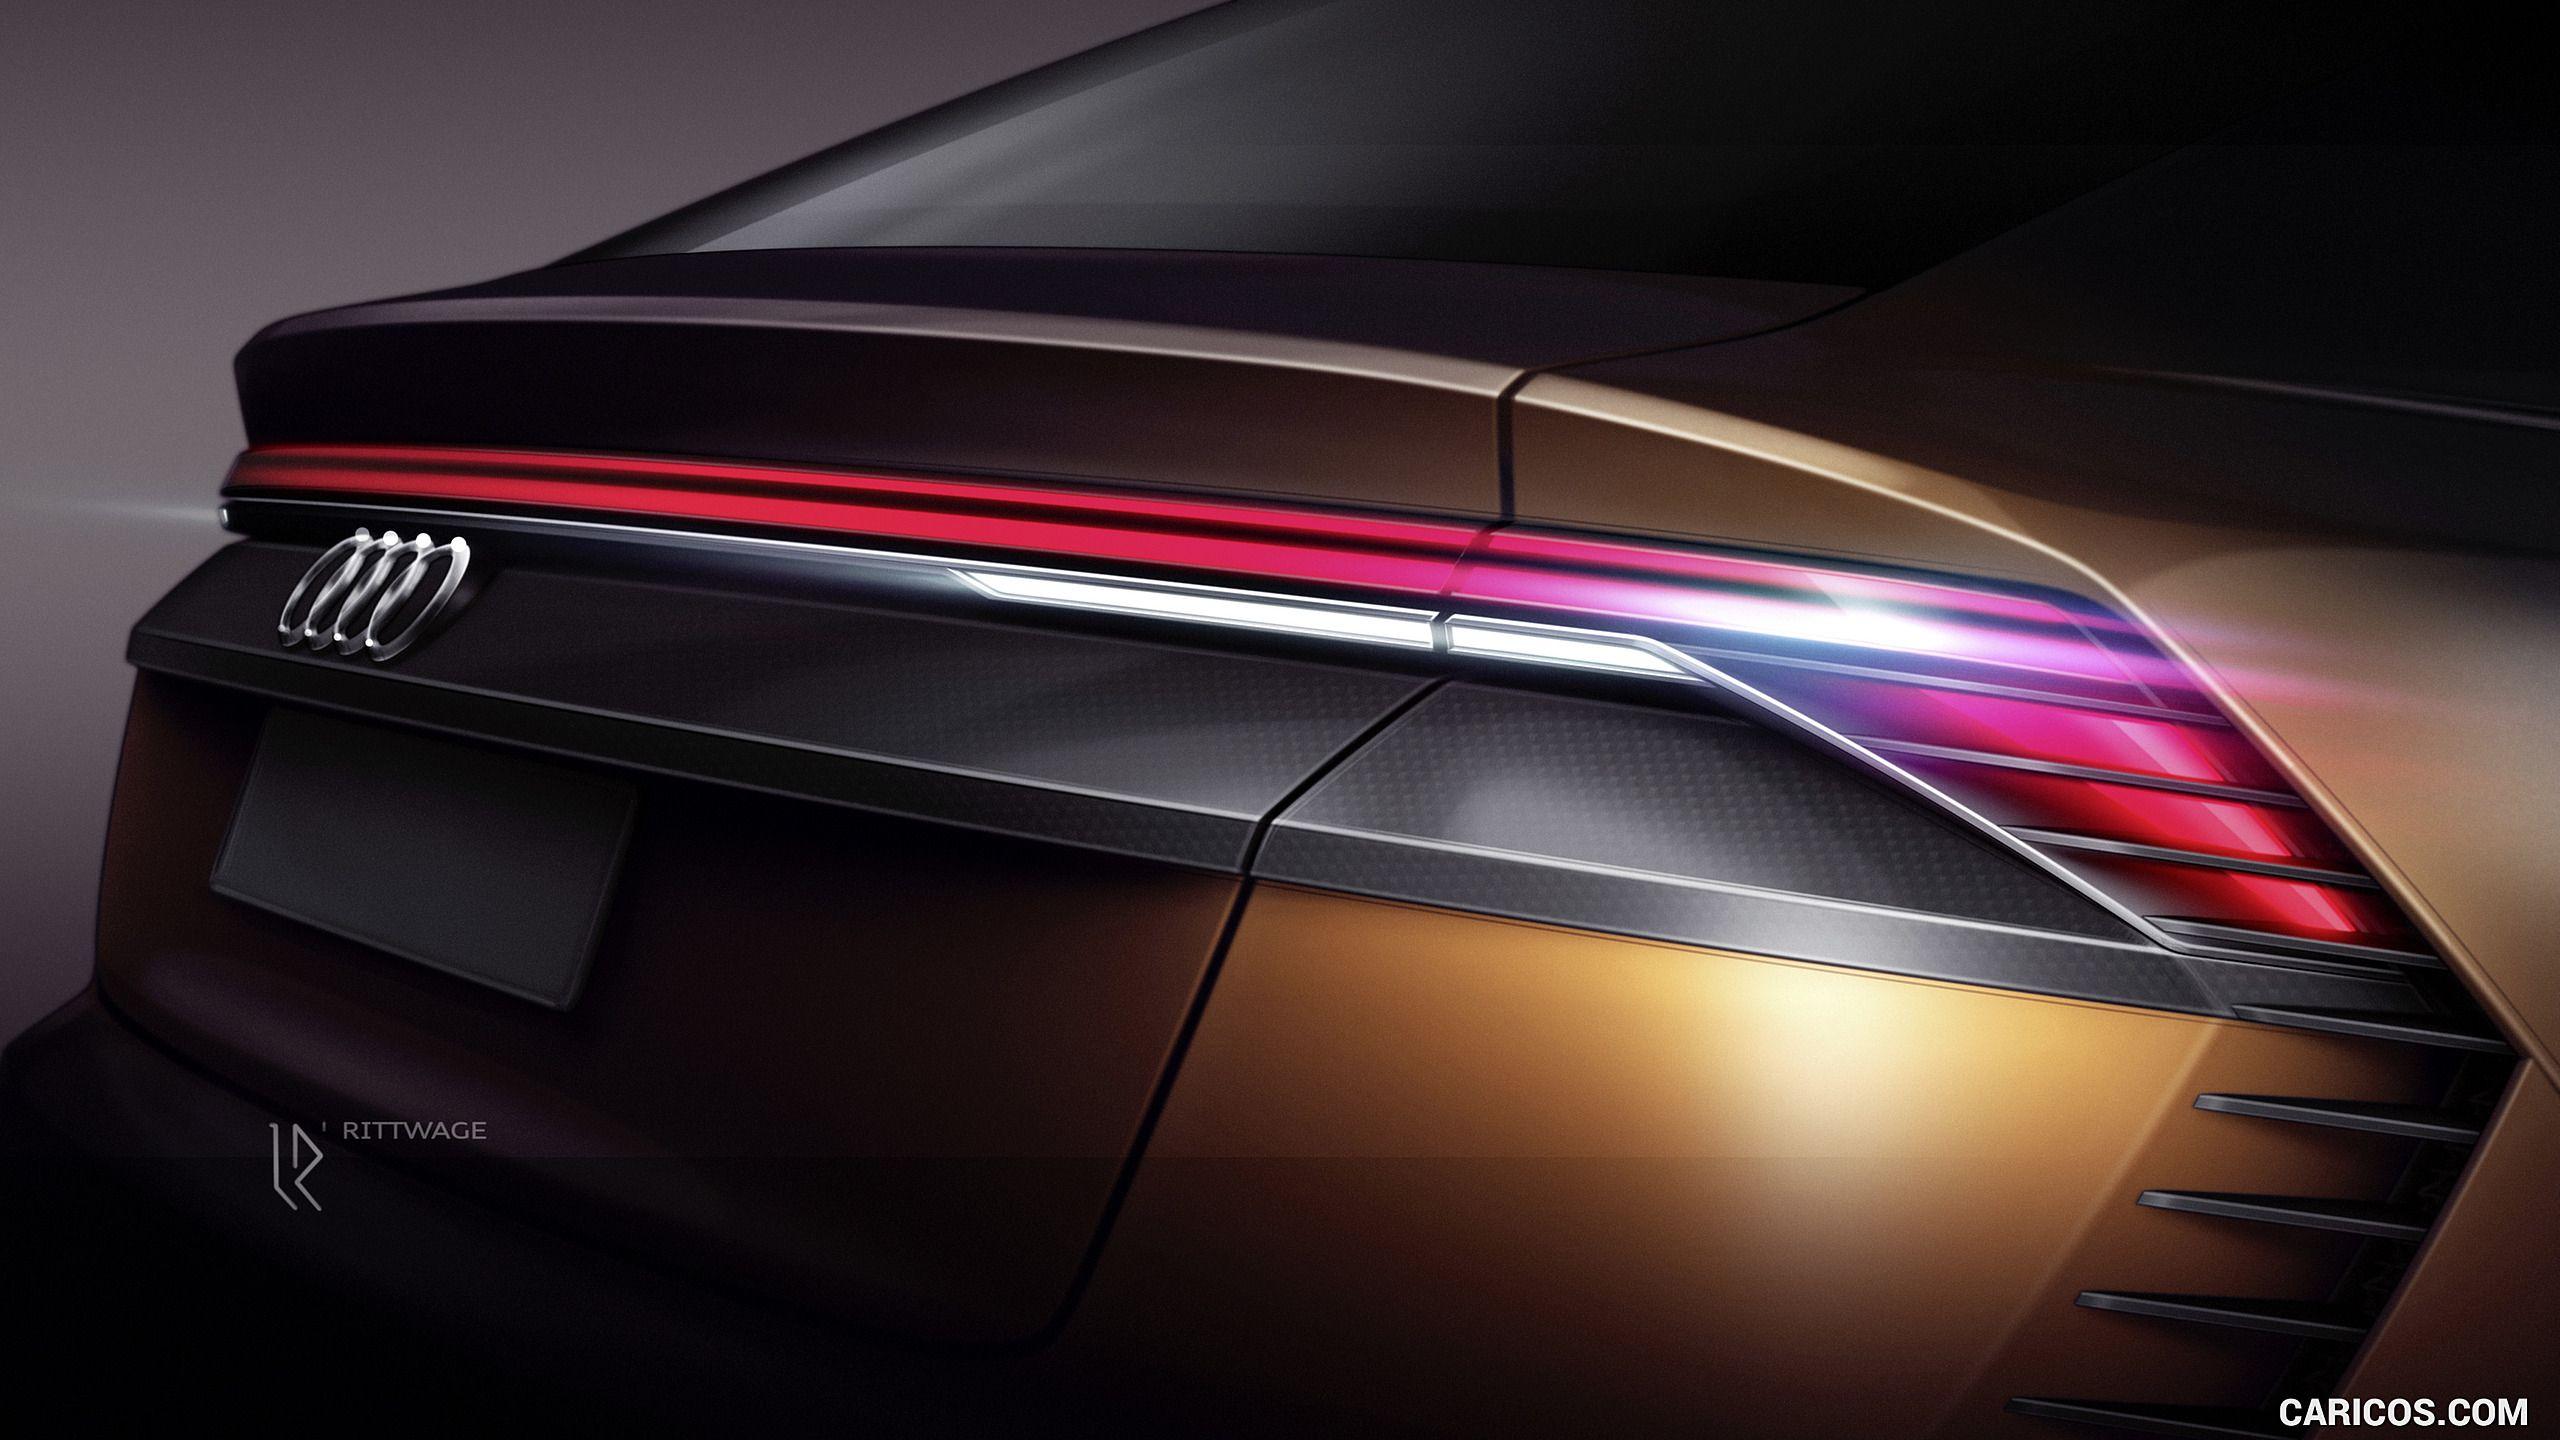 2017 Audi Q8 Sport Concept Wallpaper Automotive Design Car Design Sketch Audi